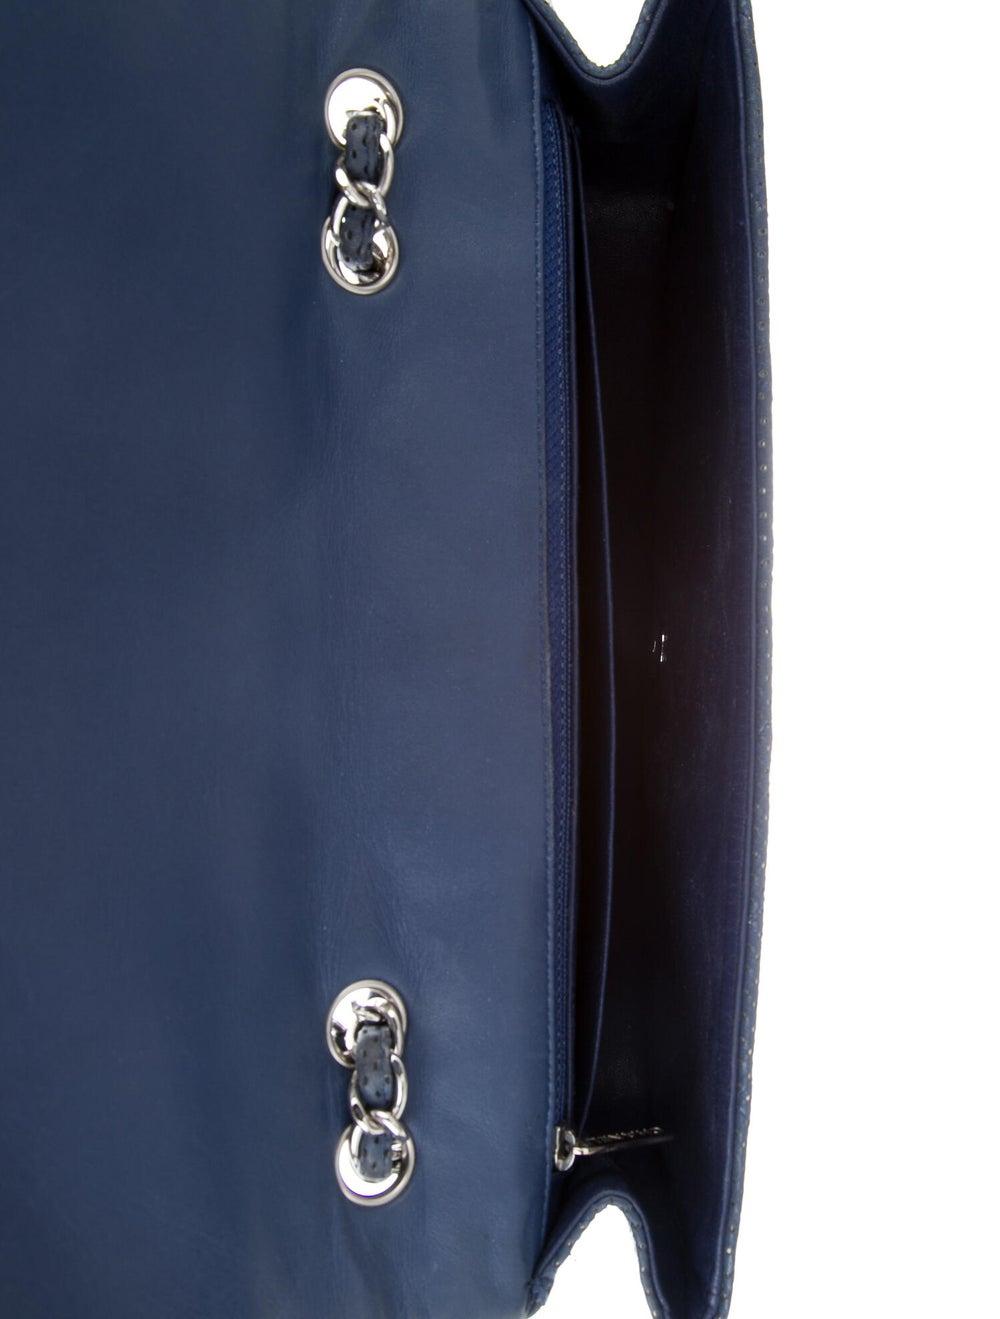 Chanel Perforated Classic Jumbo Single Flap Bag B… - image 5